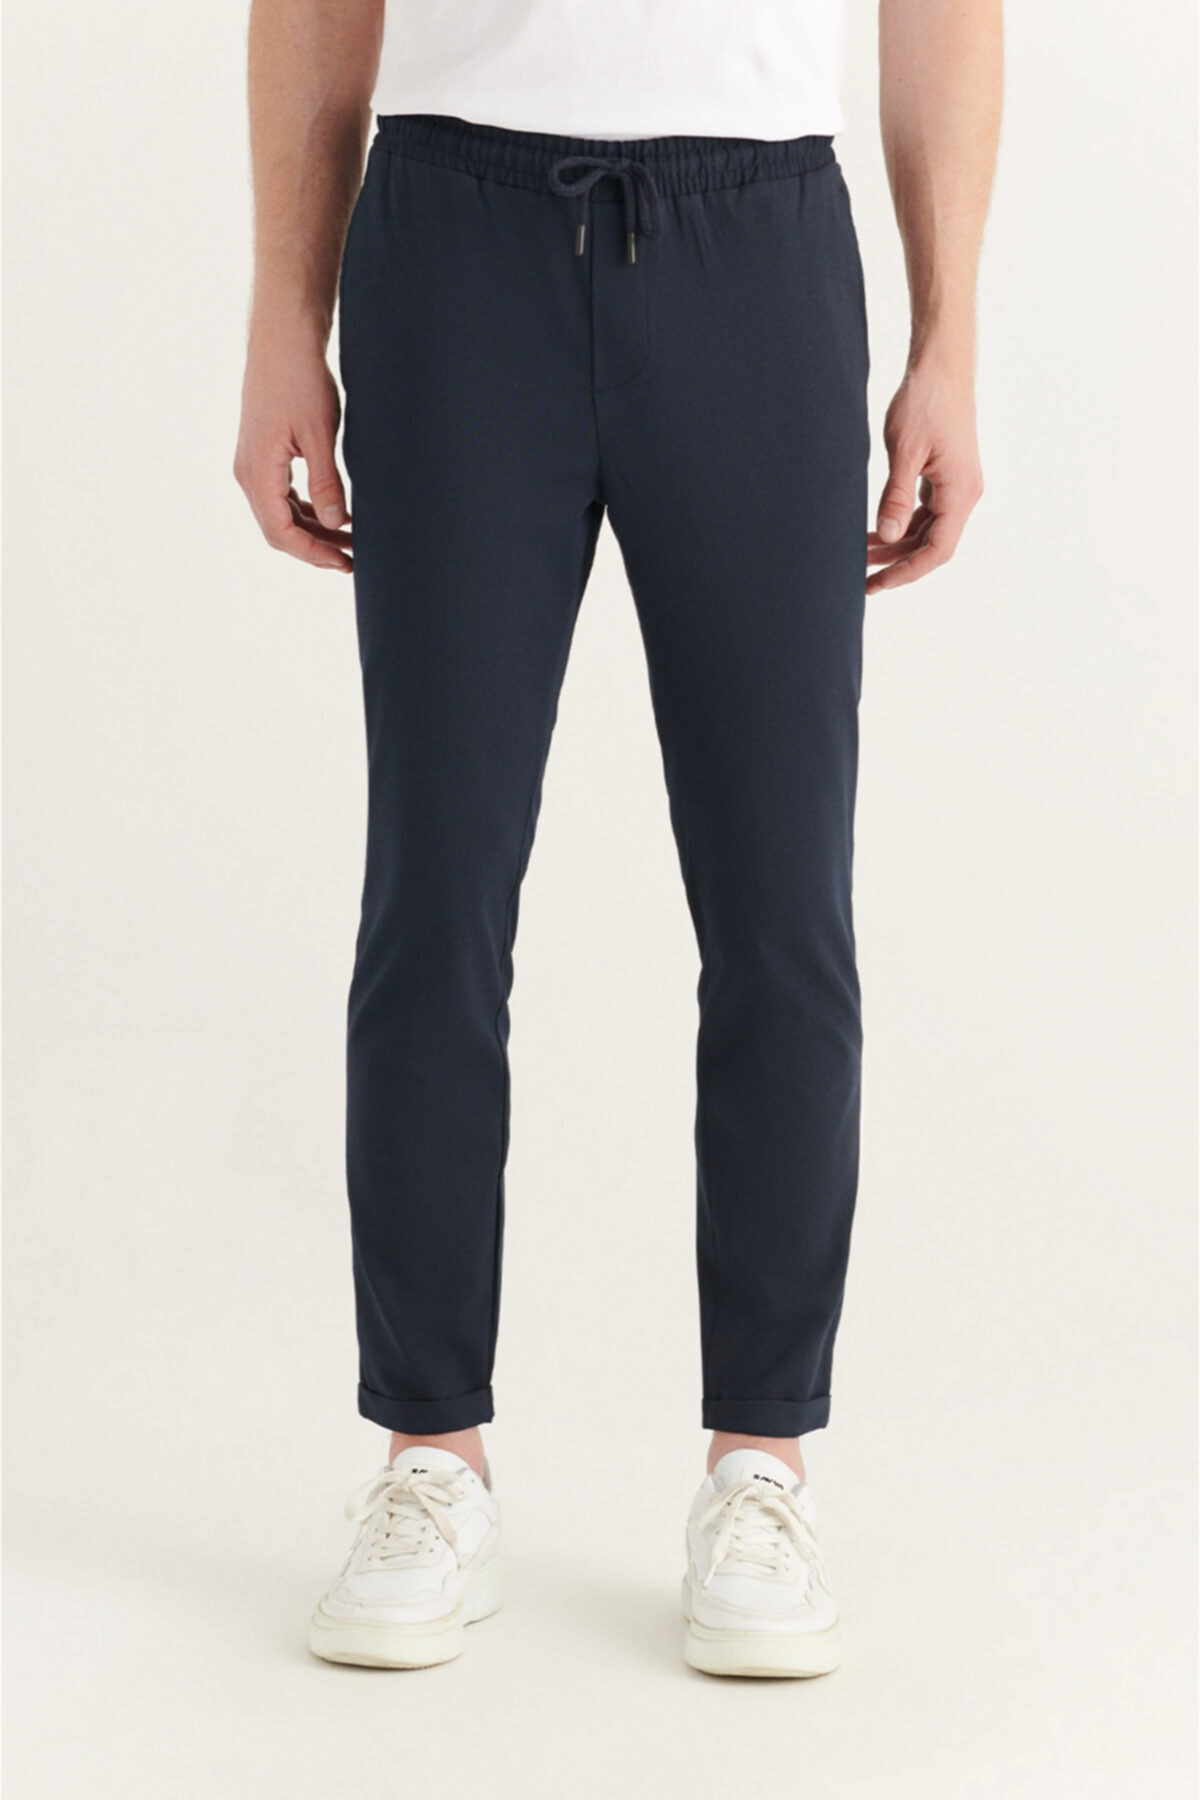 Erkek Lacivert Yandan Cepli Beli Lastikli Kordonlu Düz Relaxed Fit Pantolon E003000